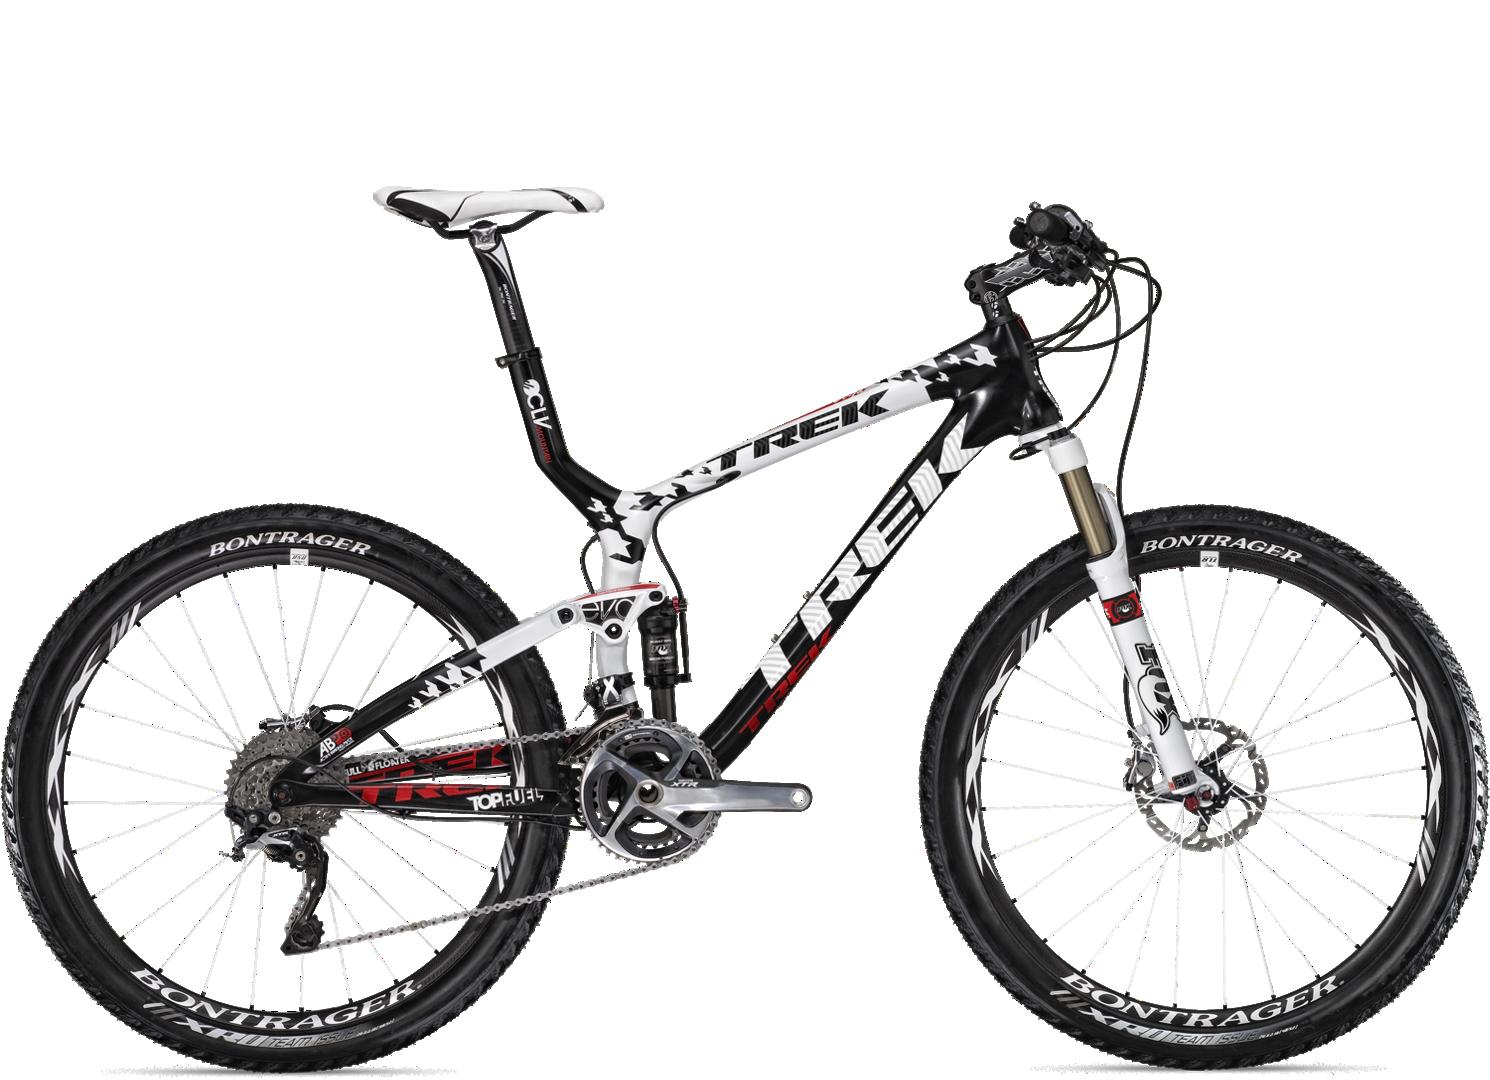 An Amazing Downhill Bike Trek Top Fuel 9 9 Ssl